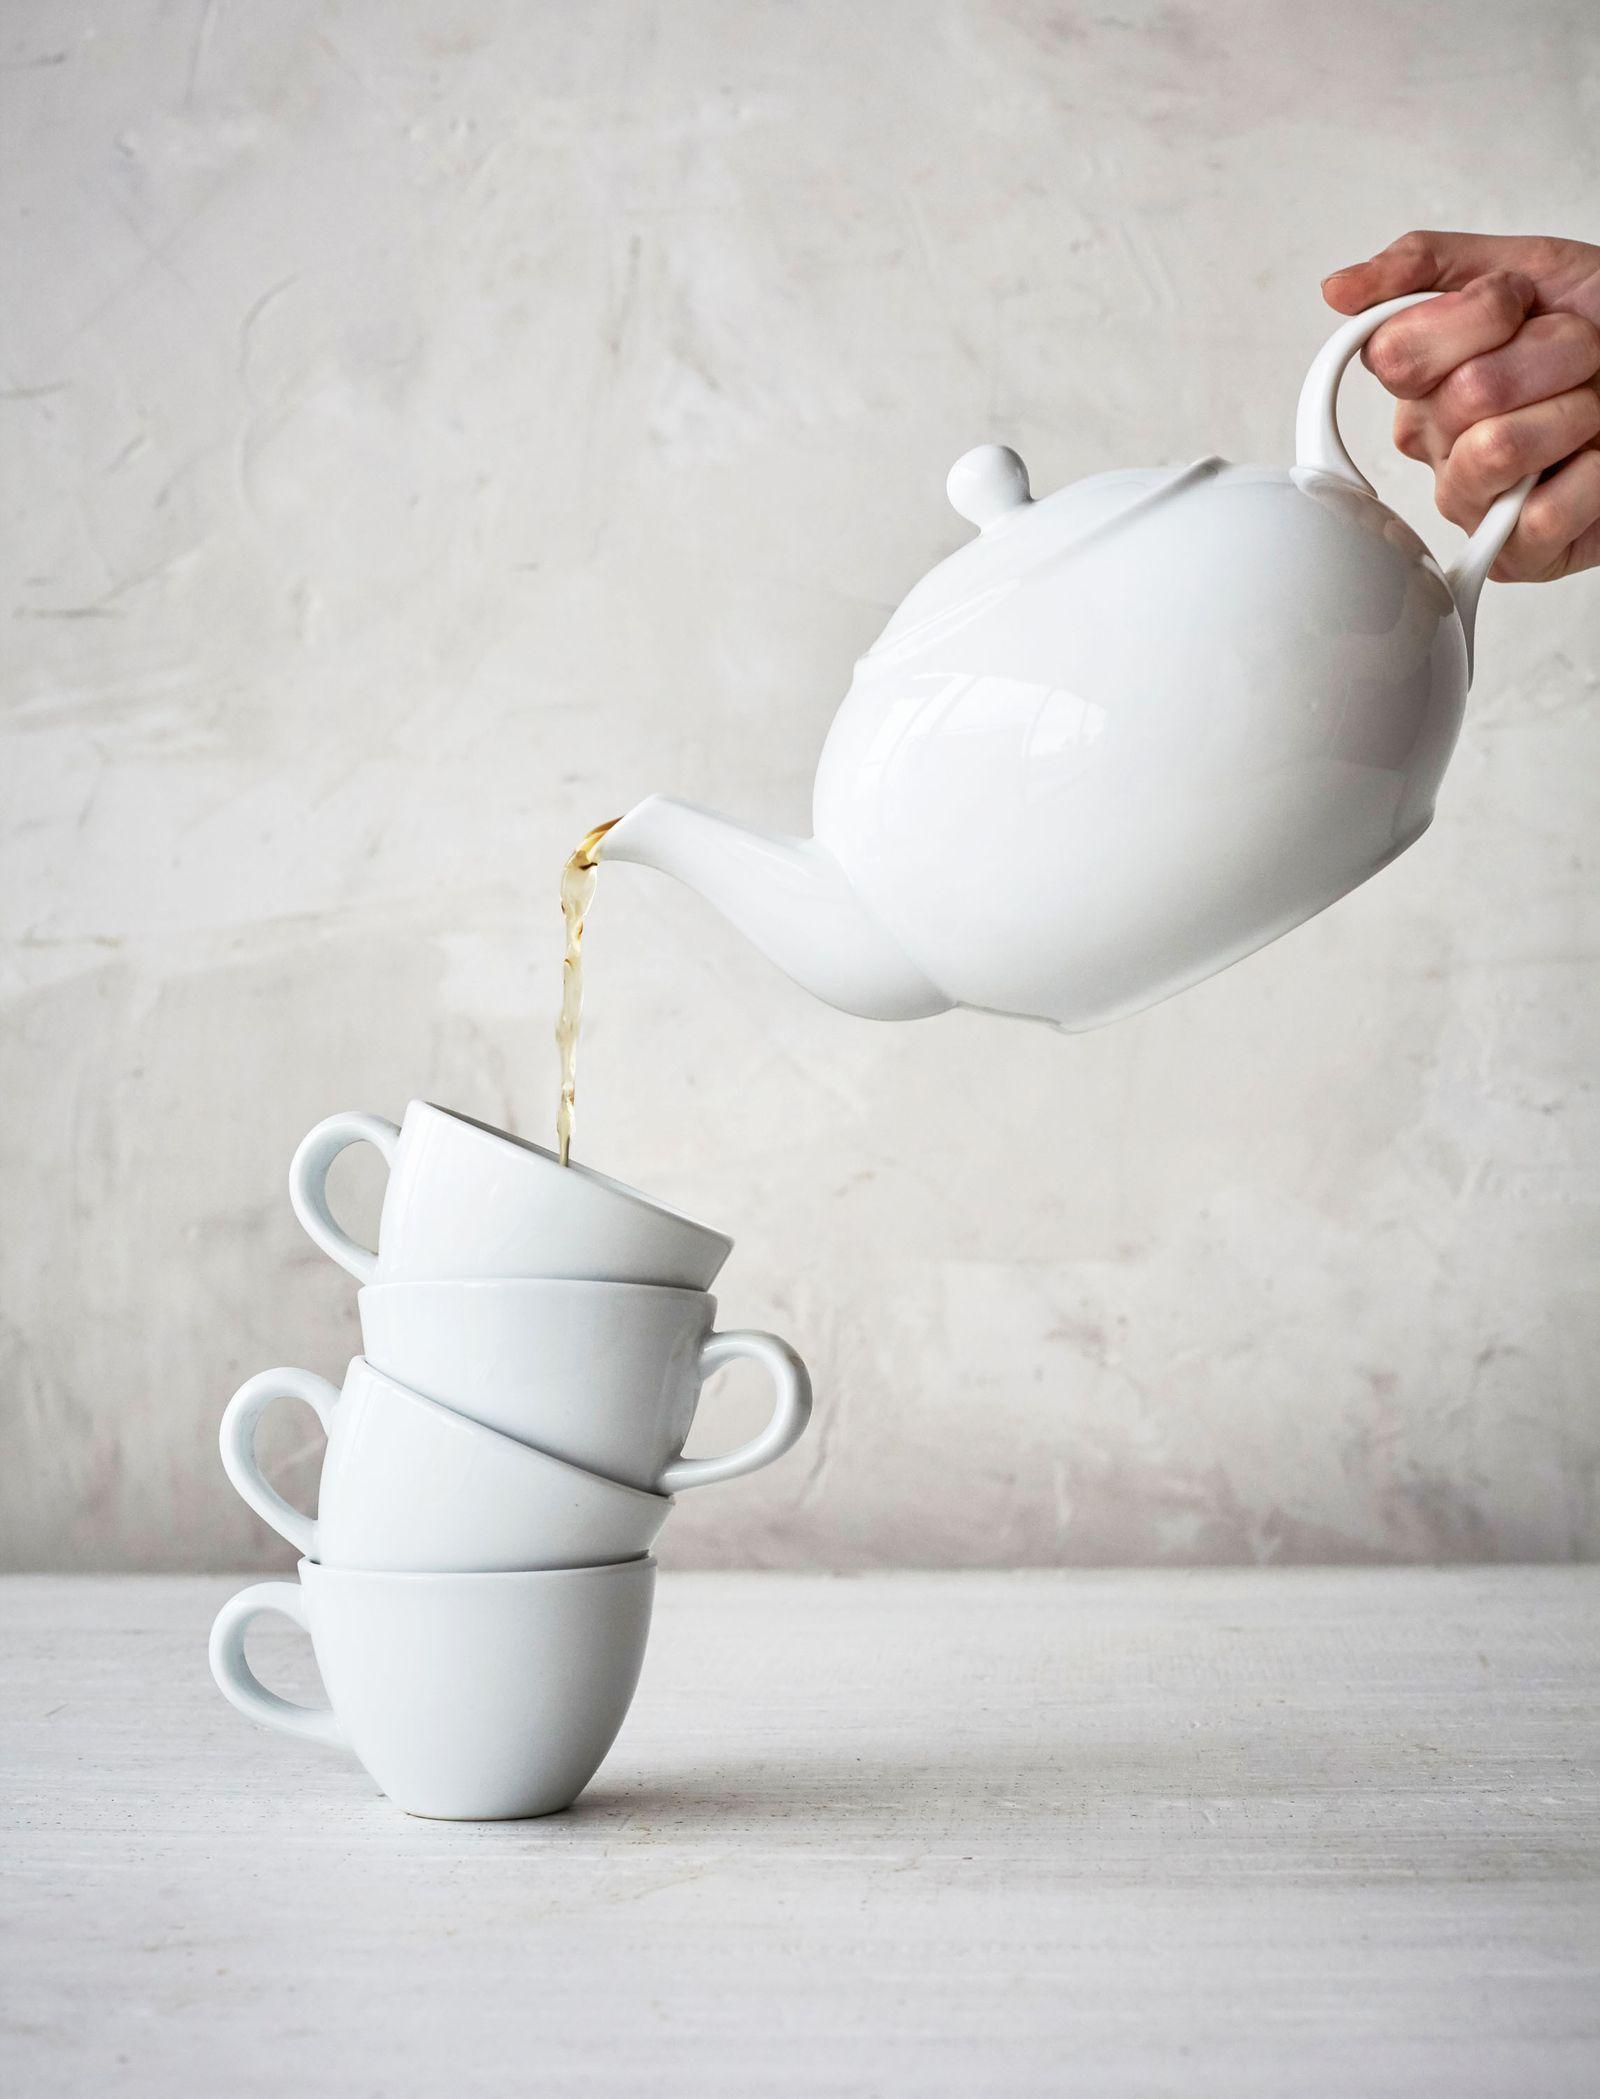 SLT_am_TeapotAndCups_01082018.jpg